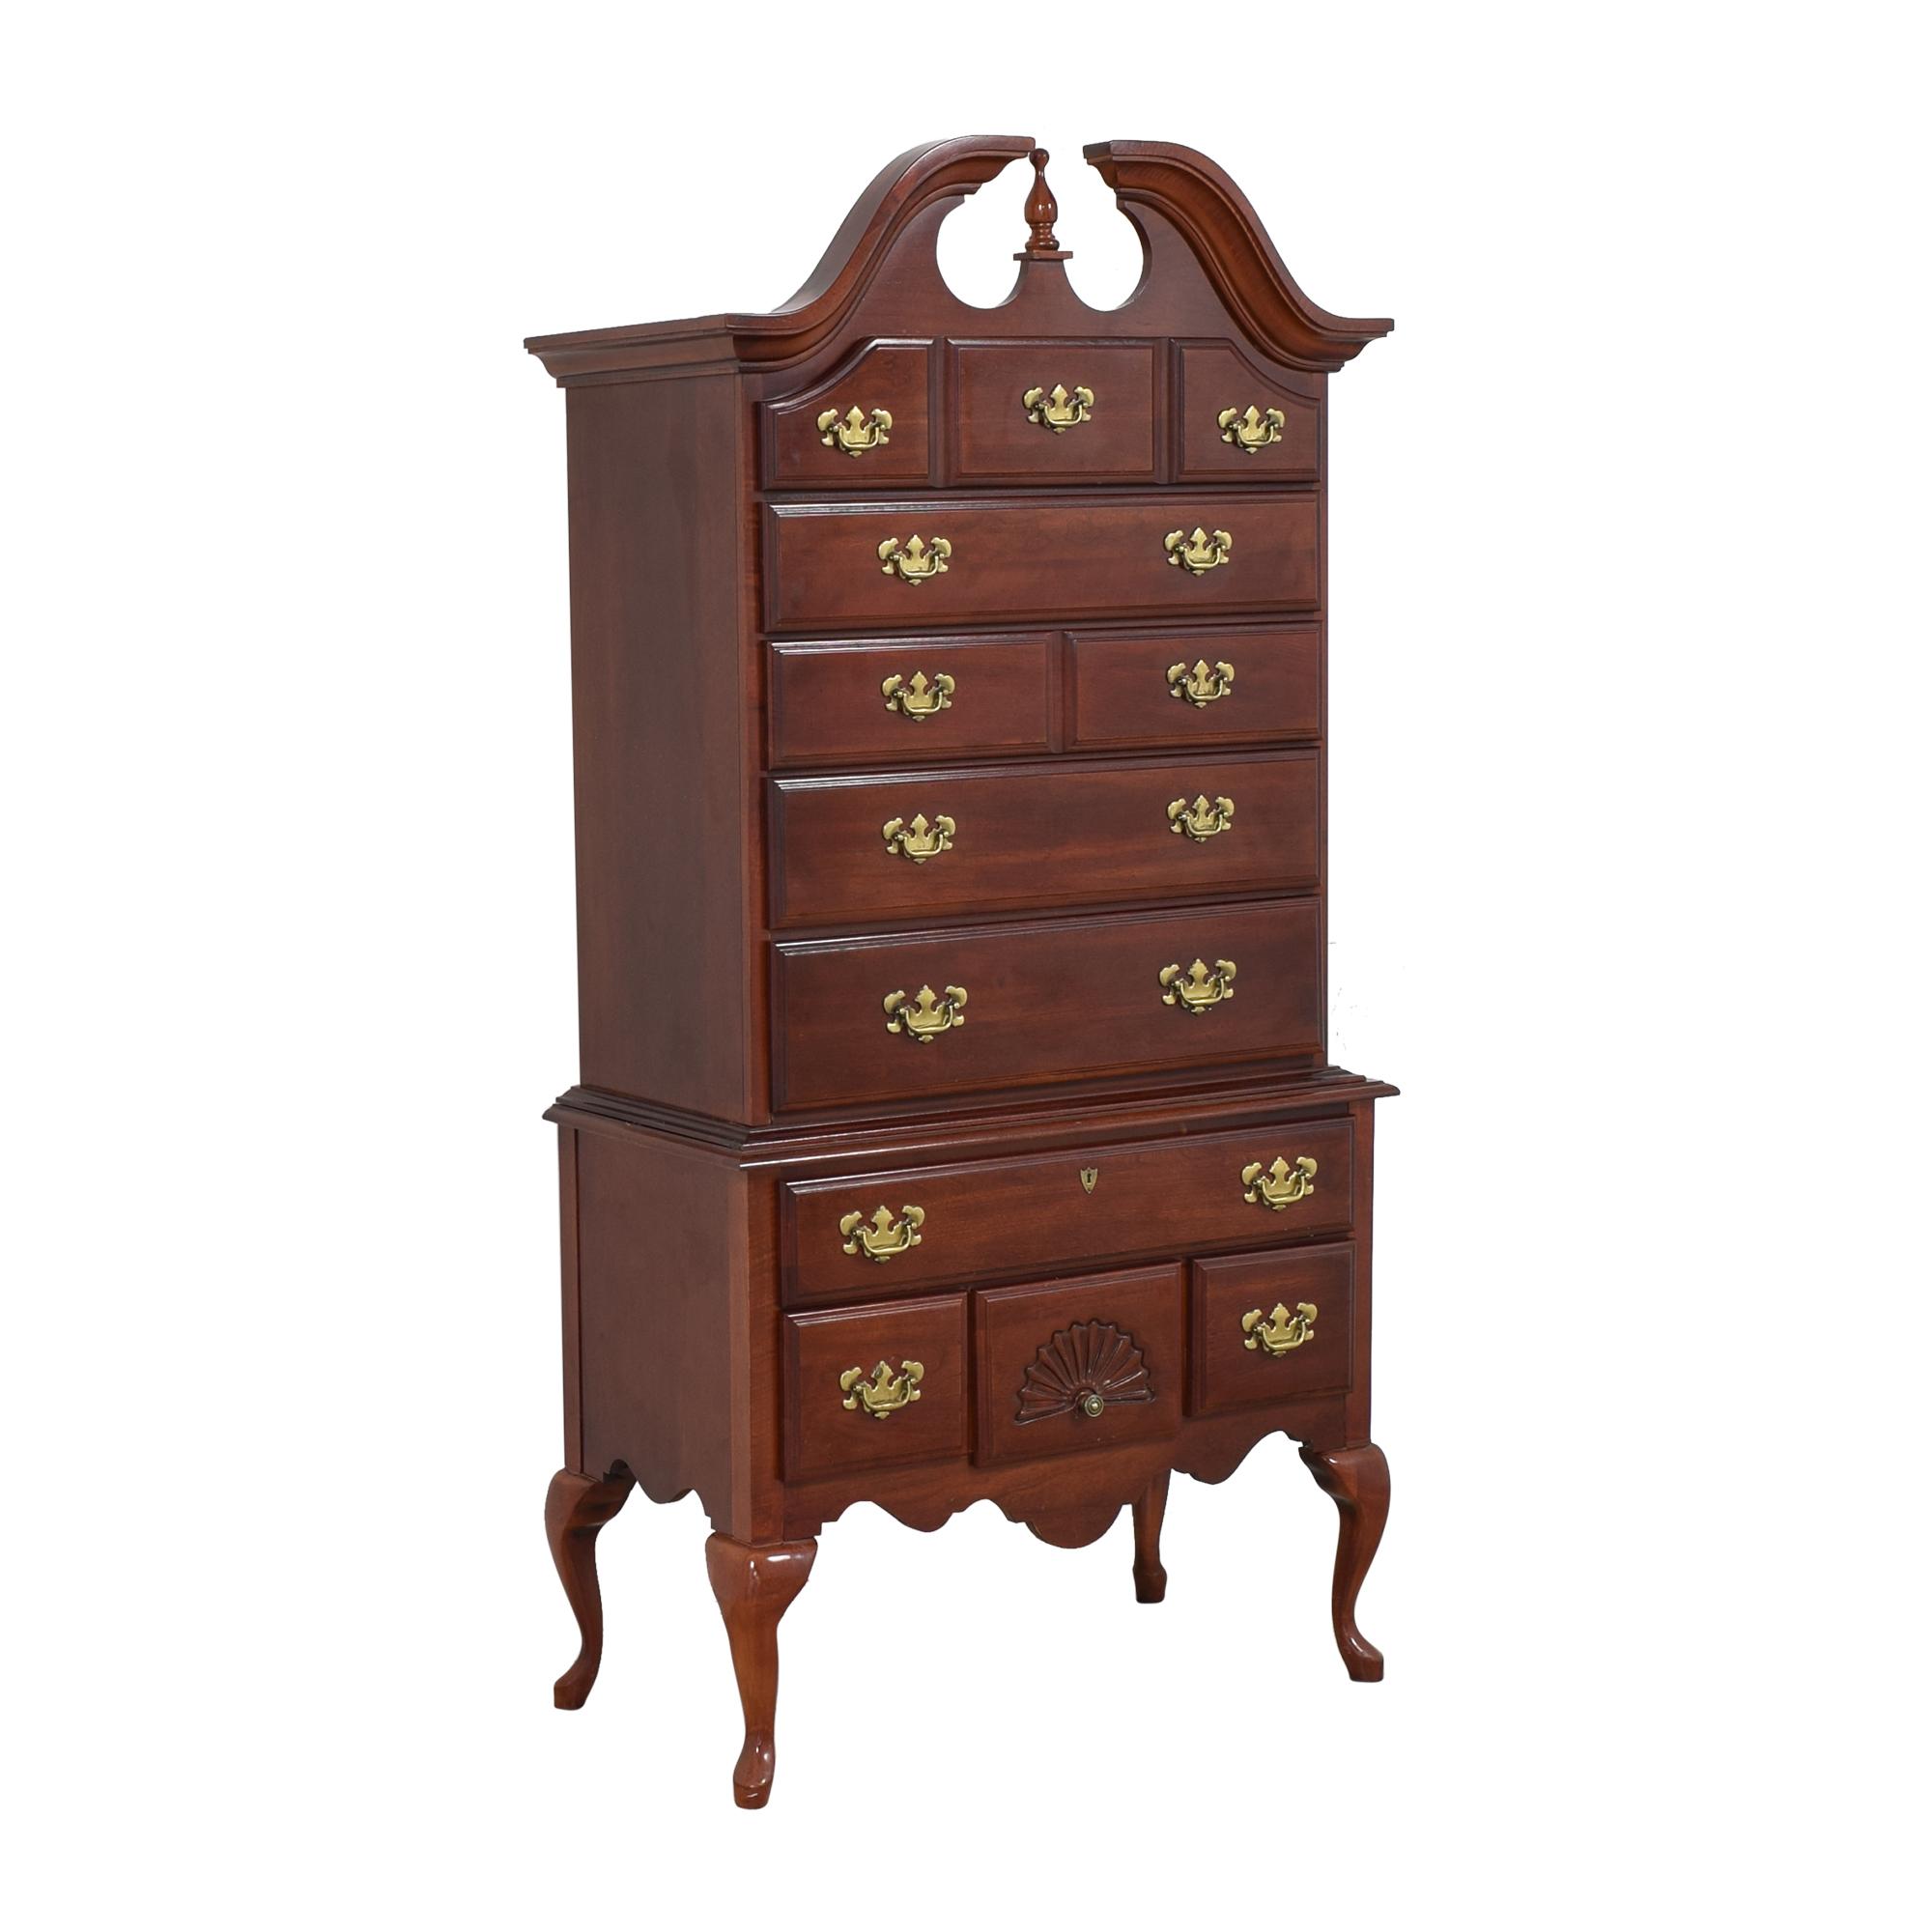 American Drew American Drew Chippendale Highboy Chest Dressers